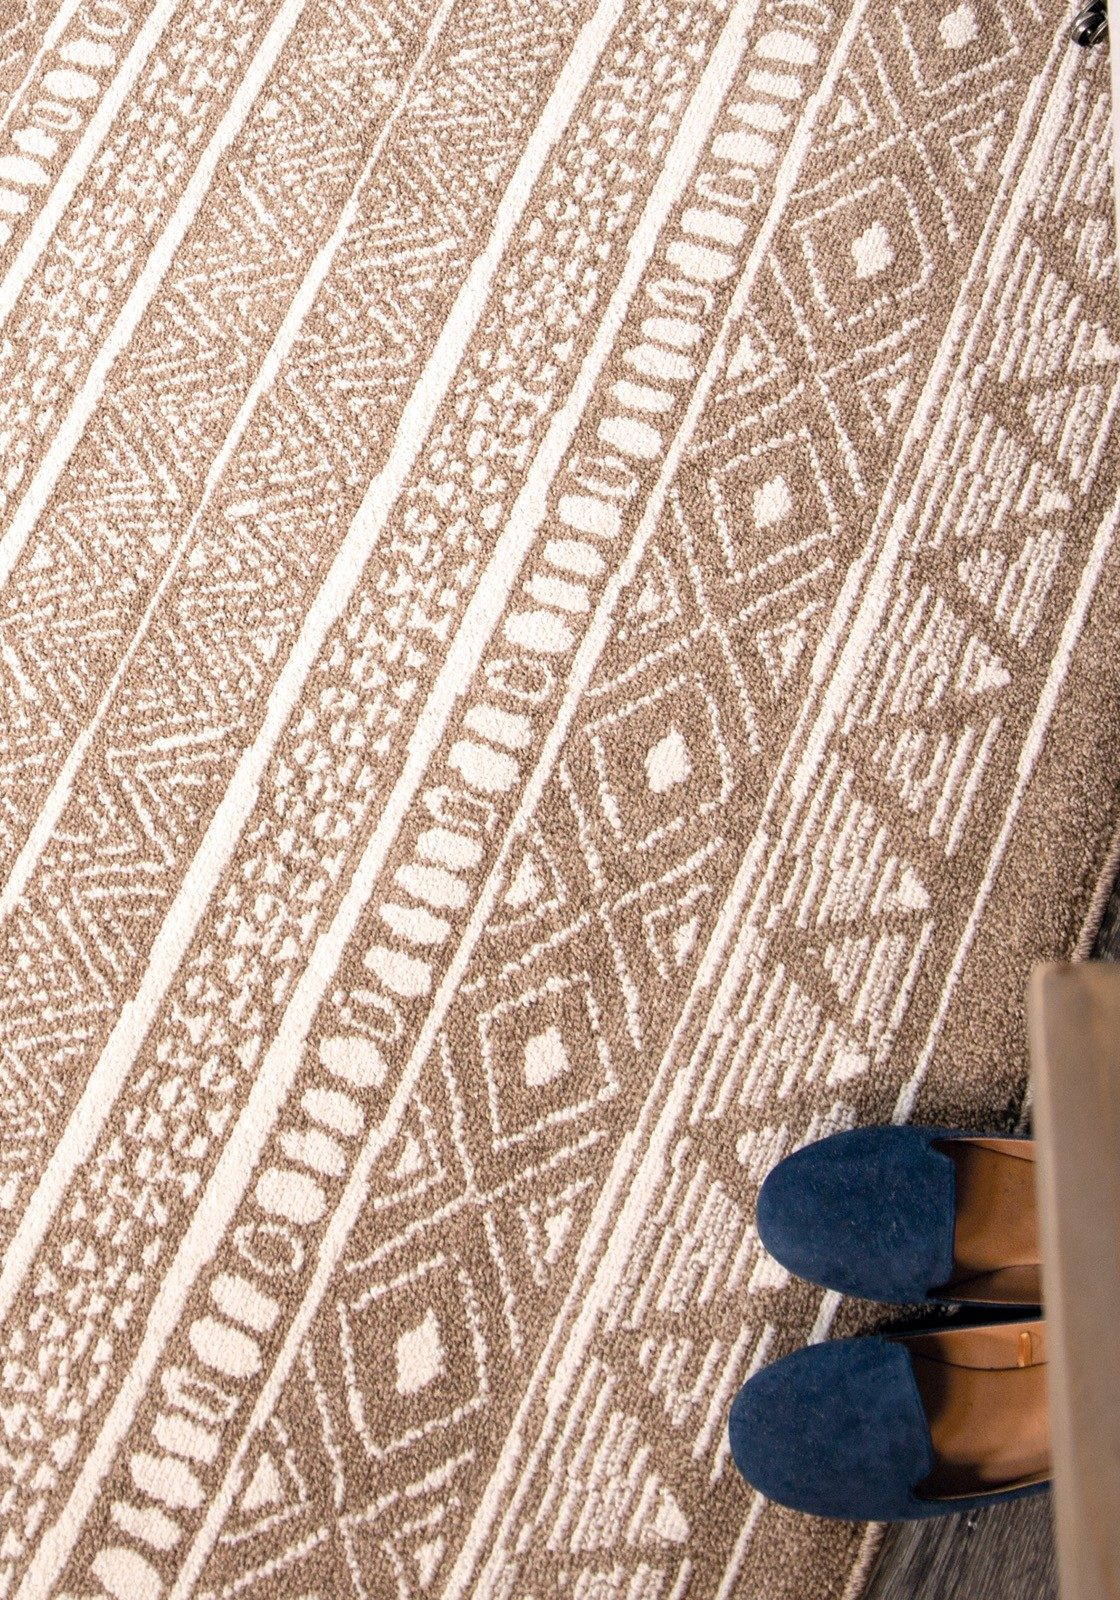 Rug design | Great Lakes Carpet & Tile